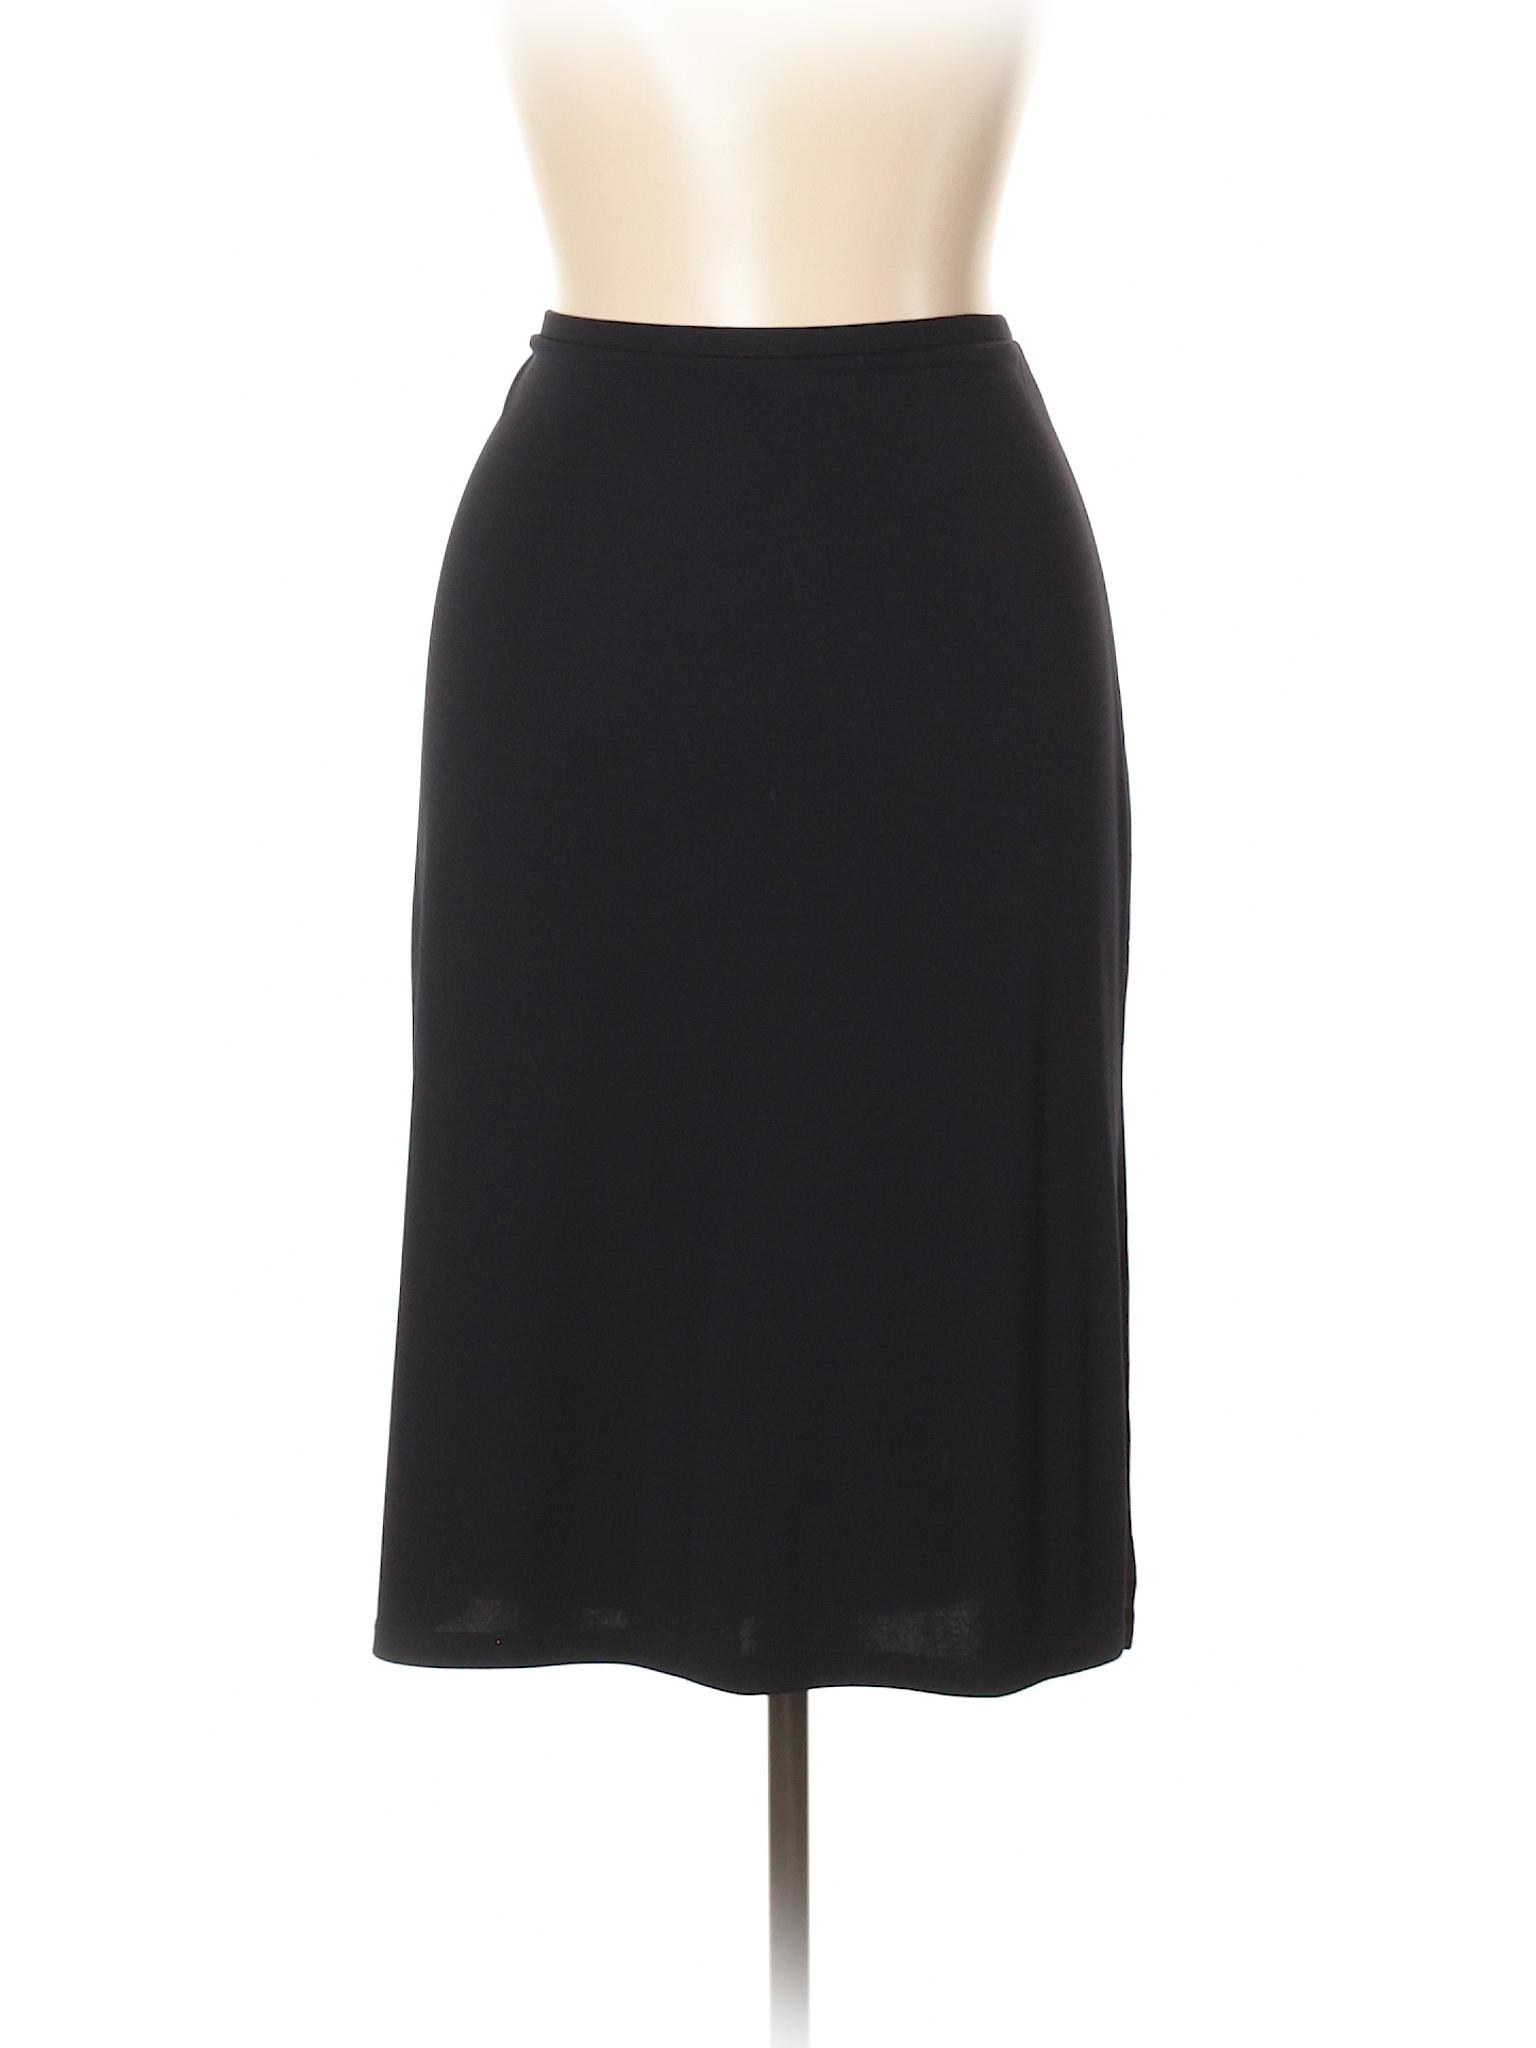 Skirt Boutique Casual Casual Boutique Xq7wSx4xg